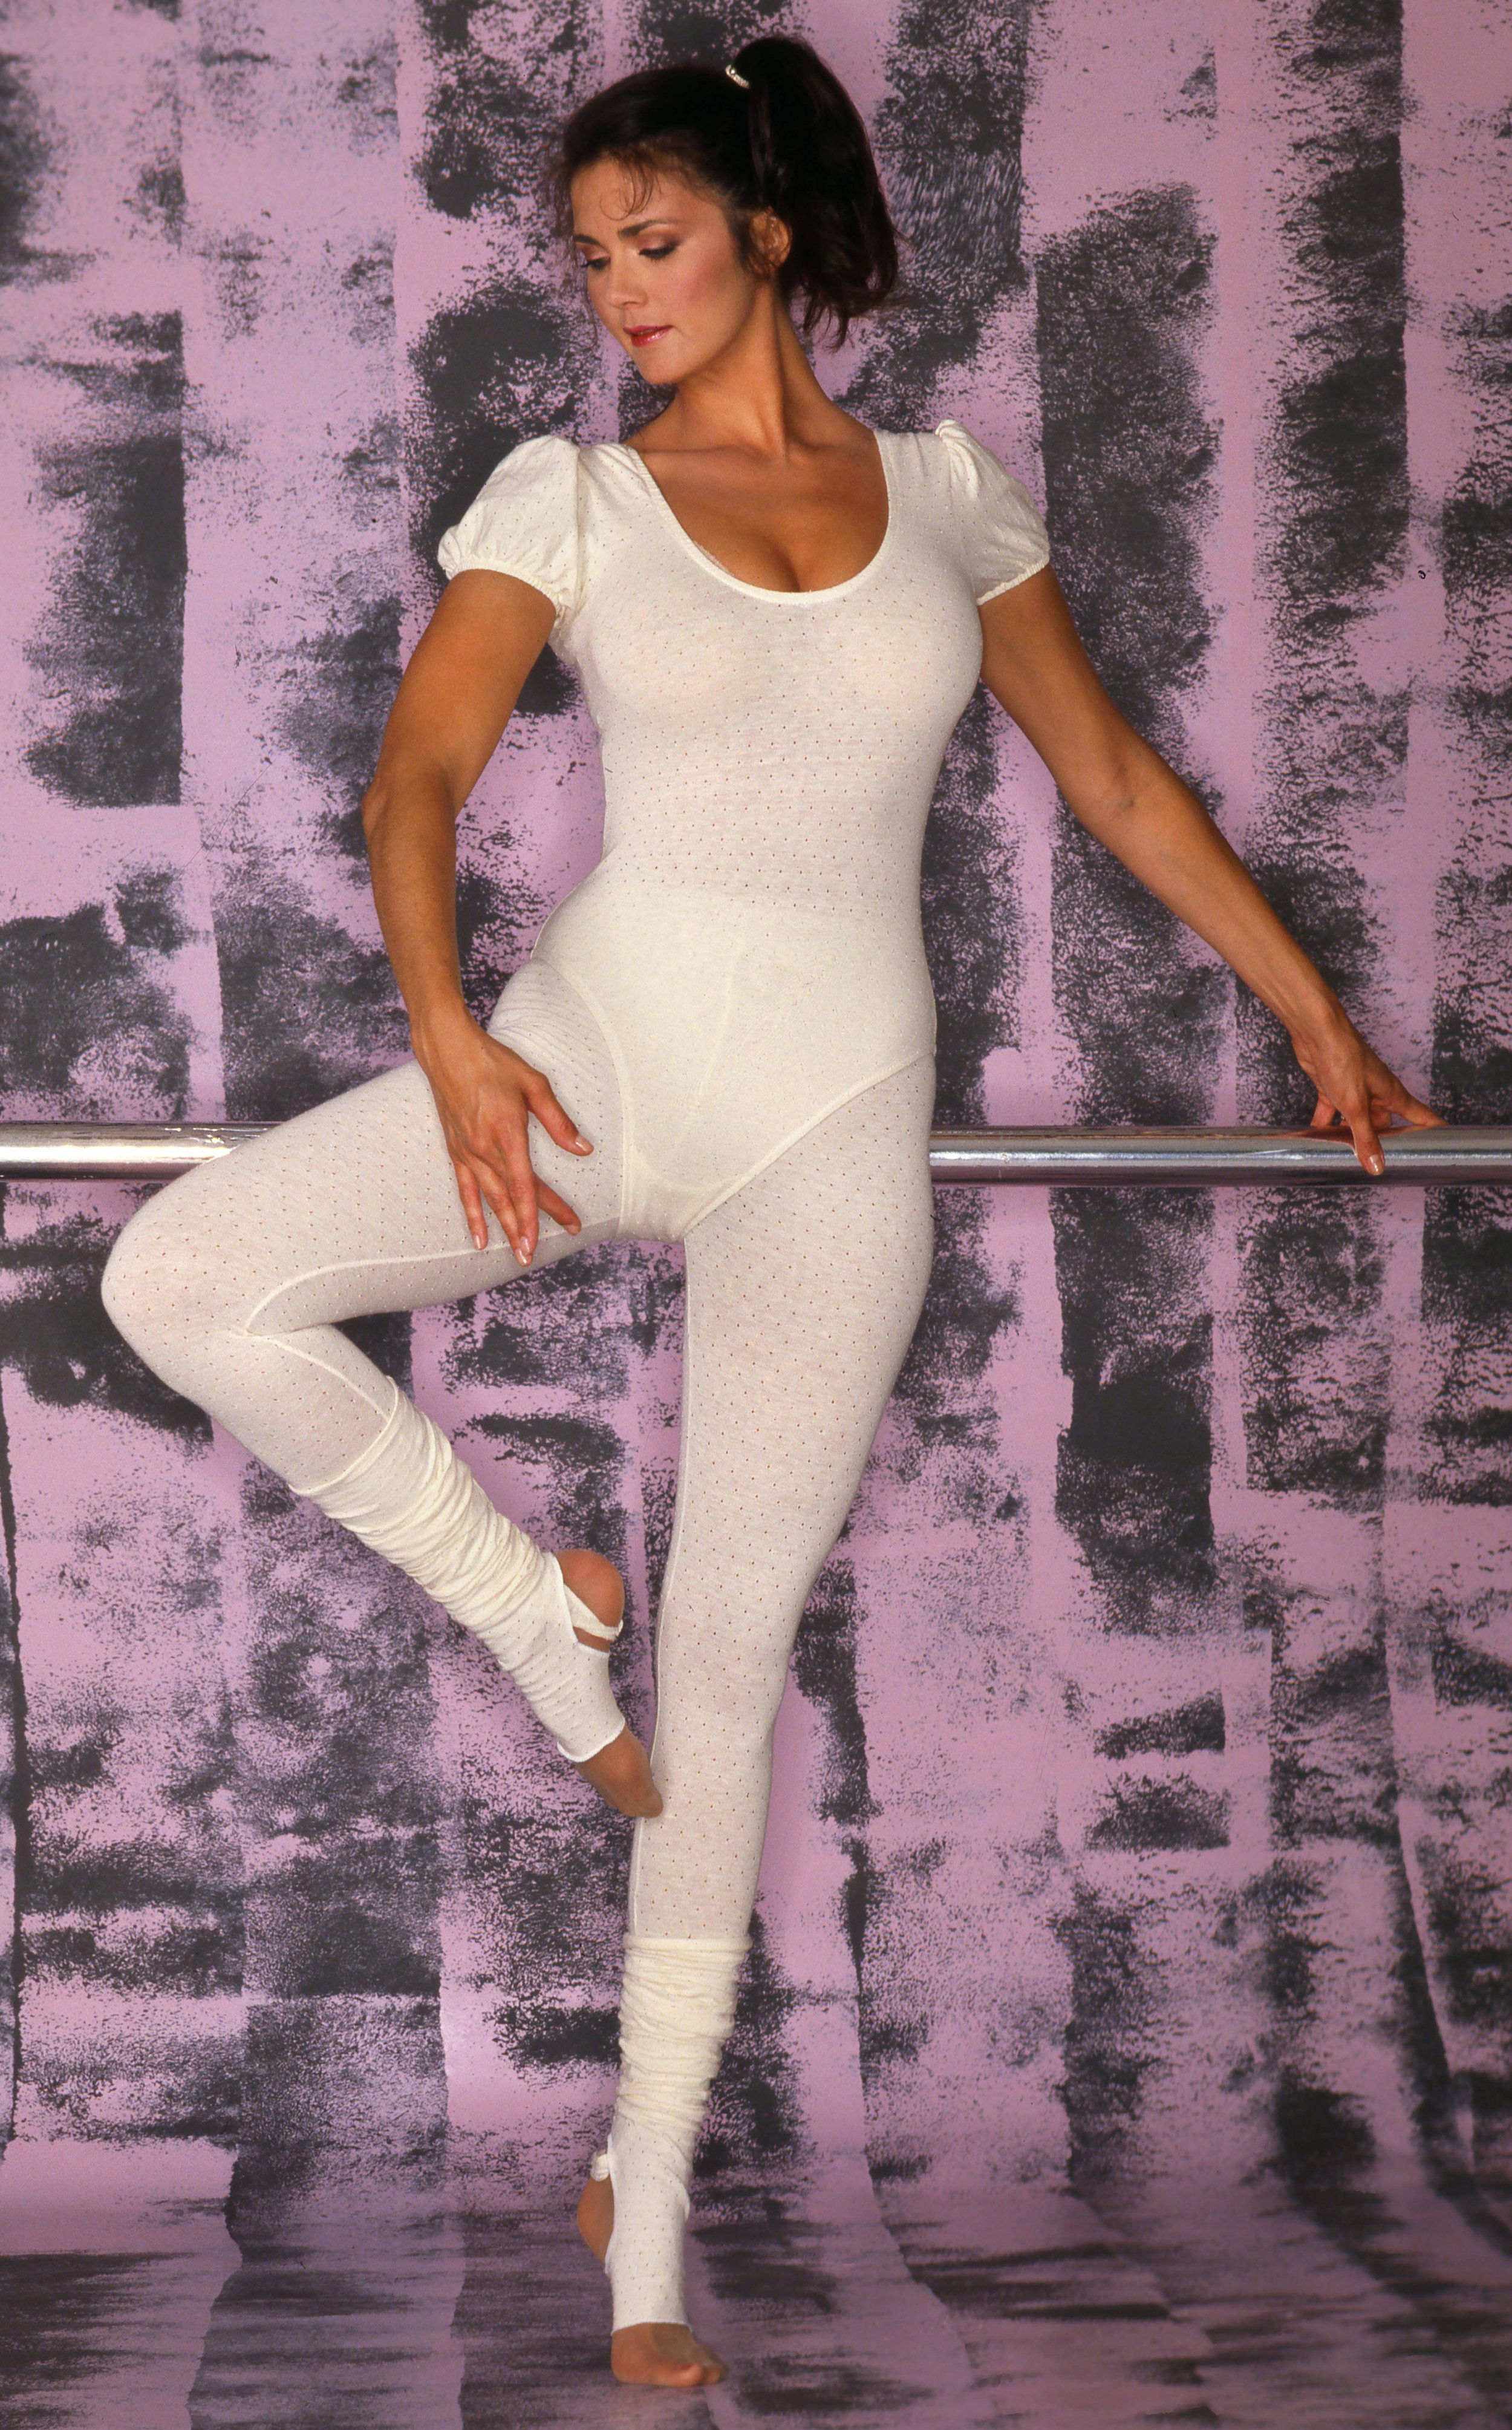 Lynda Carter 02.jpg